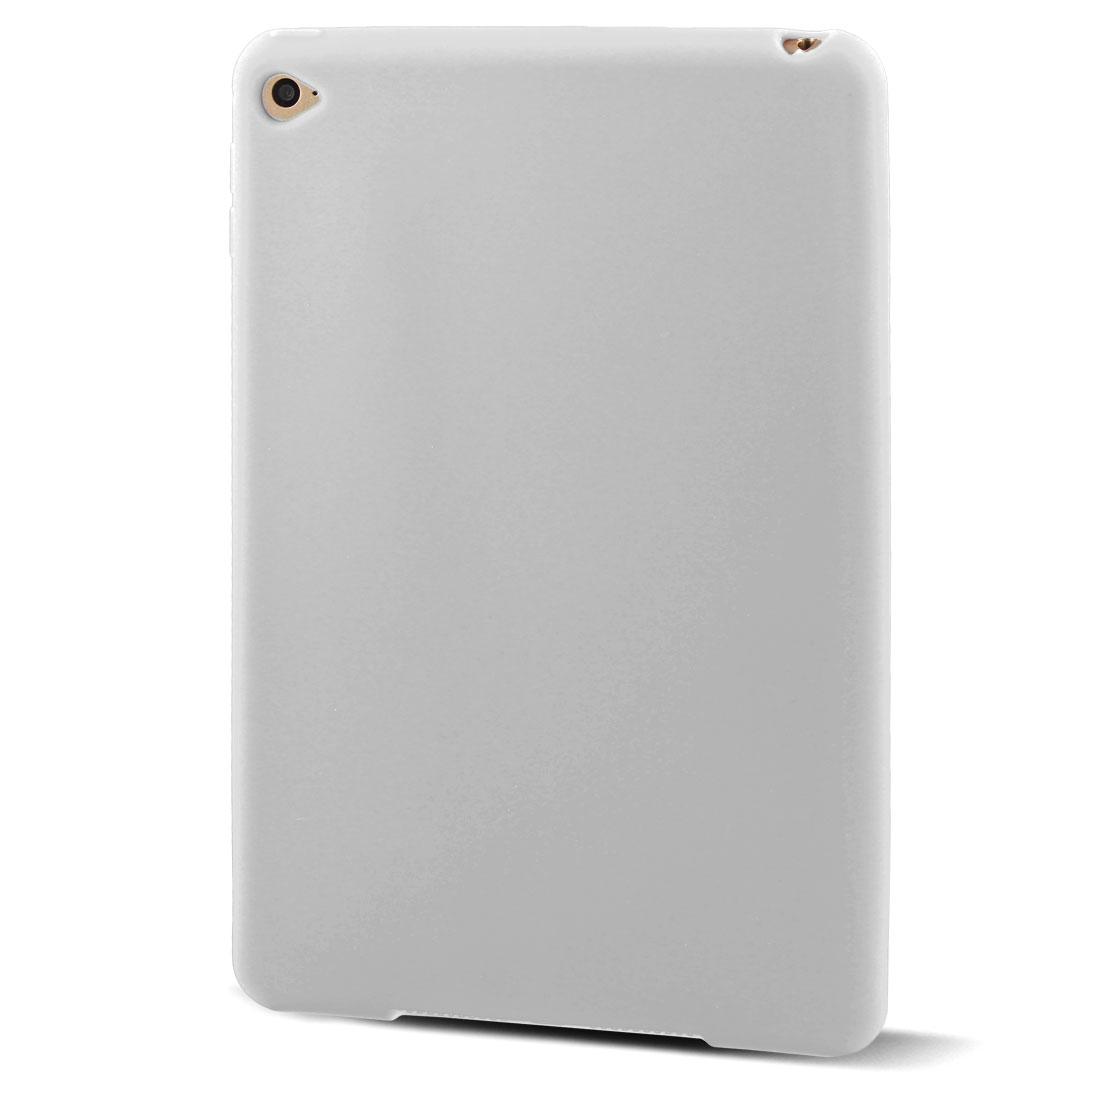 Unique BargainsRubber Protective Skin Back Cover Case White for iPad Mini 4 - image 7 of 7